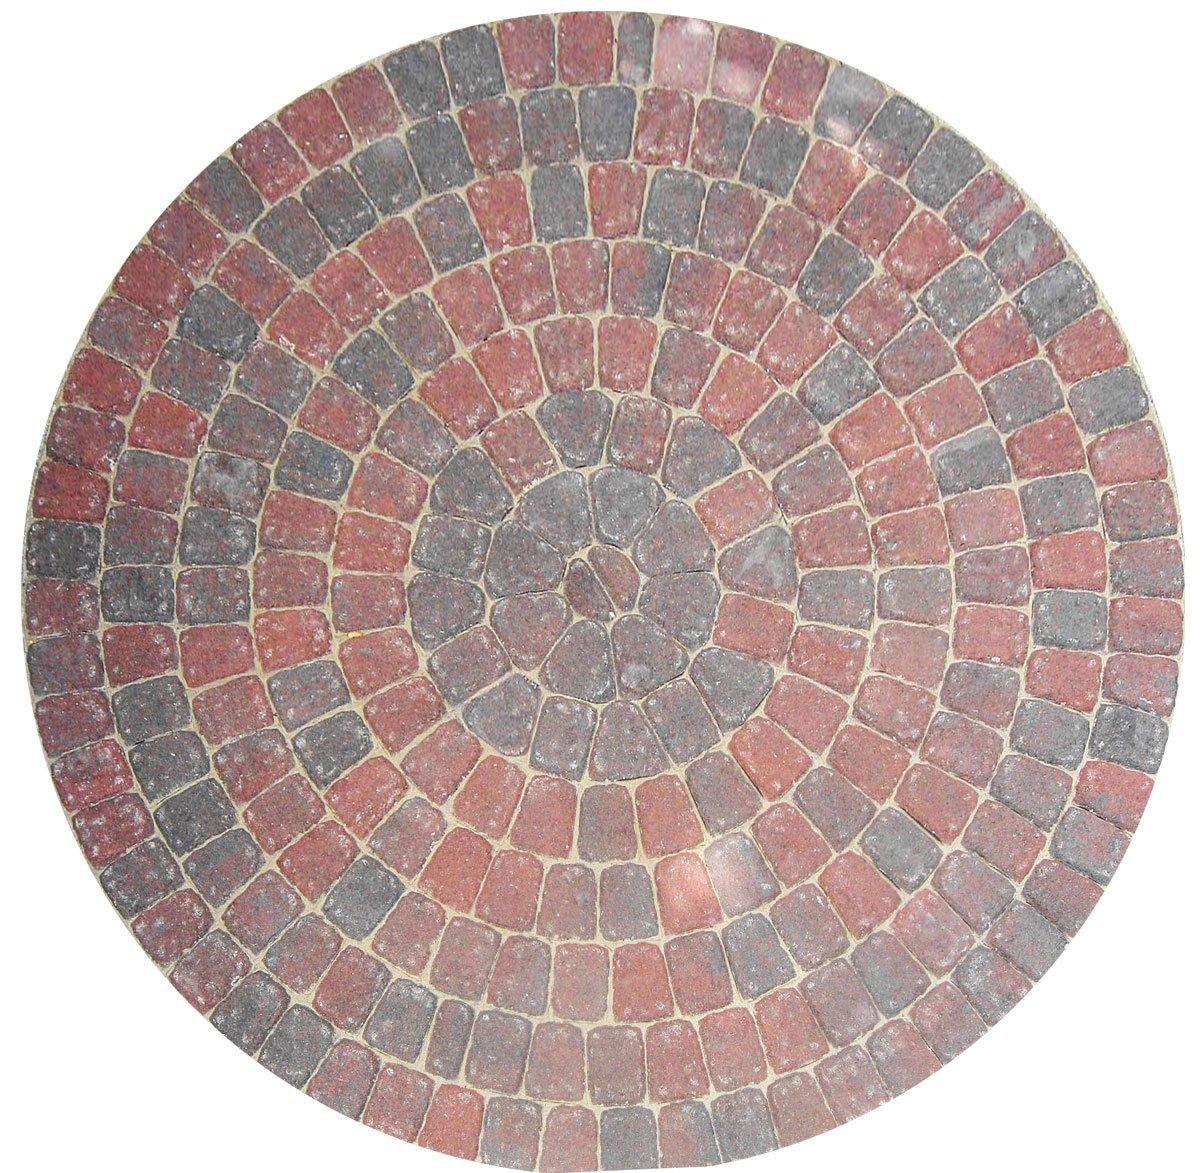 Century Series Cobble Circle Kit  Romanstone Hardscapes